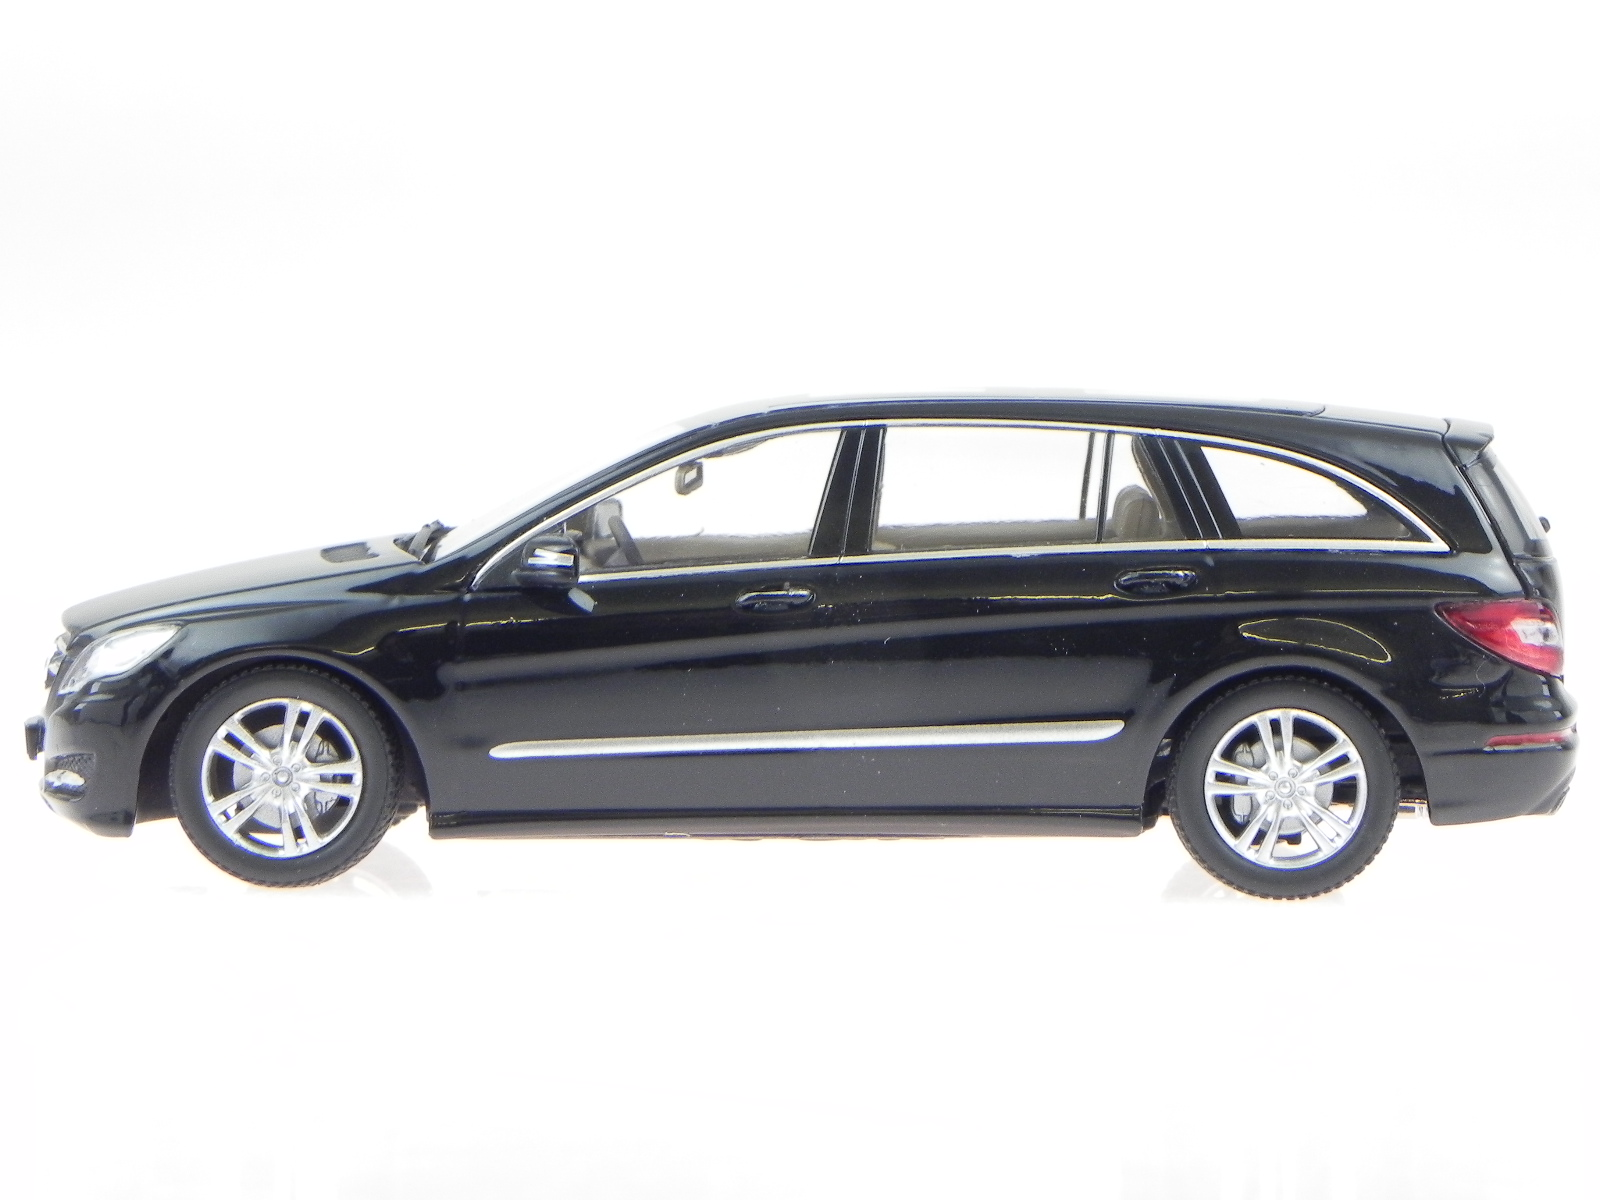 mercedes w251 r klasse schwarz modellauto minichamps 1 43. Black Bedroom Furniture Sets. Home Design Ideas